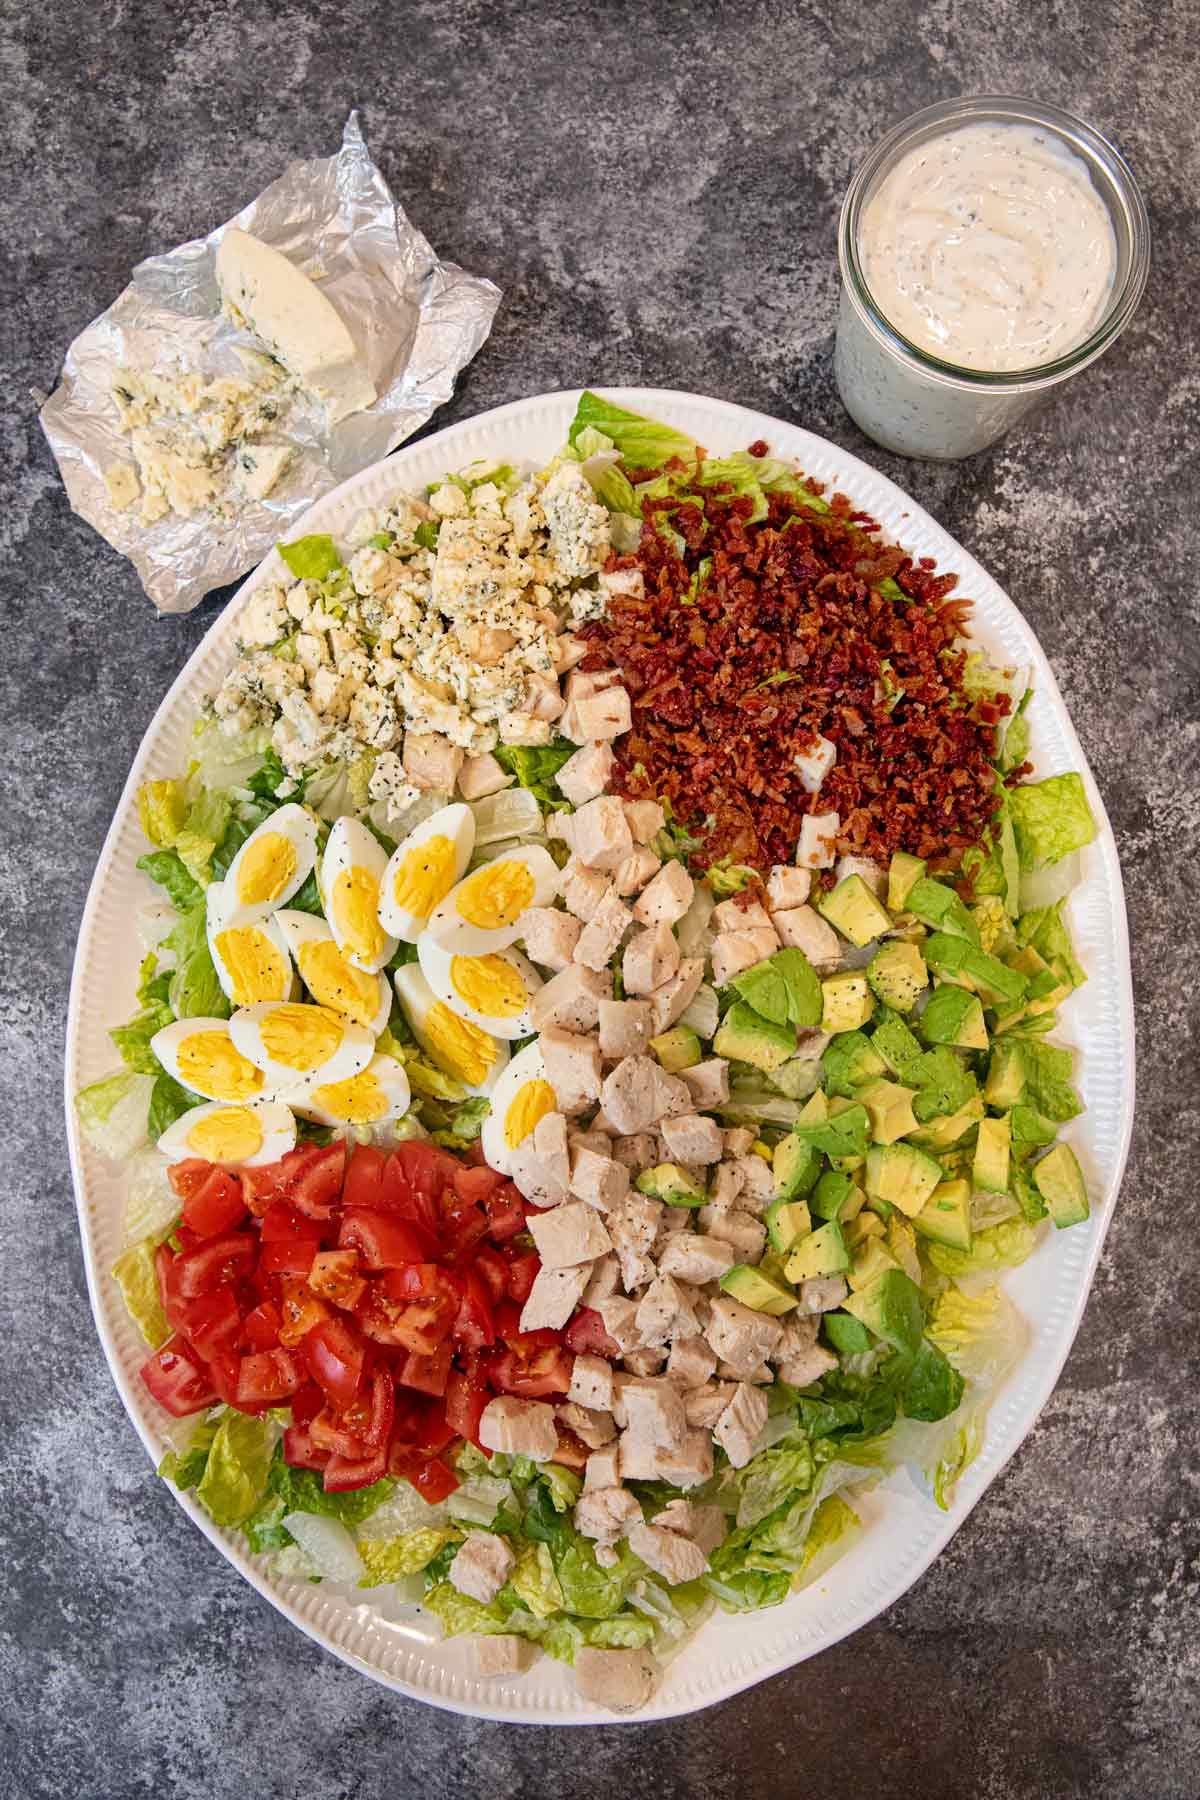 Cobb Salad on serving plate